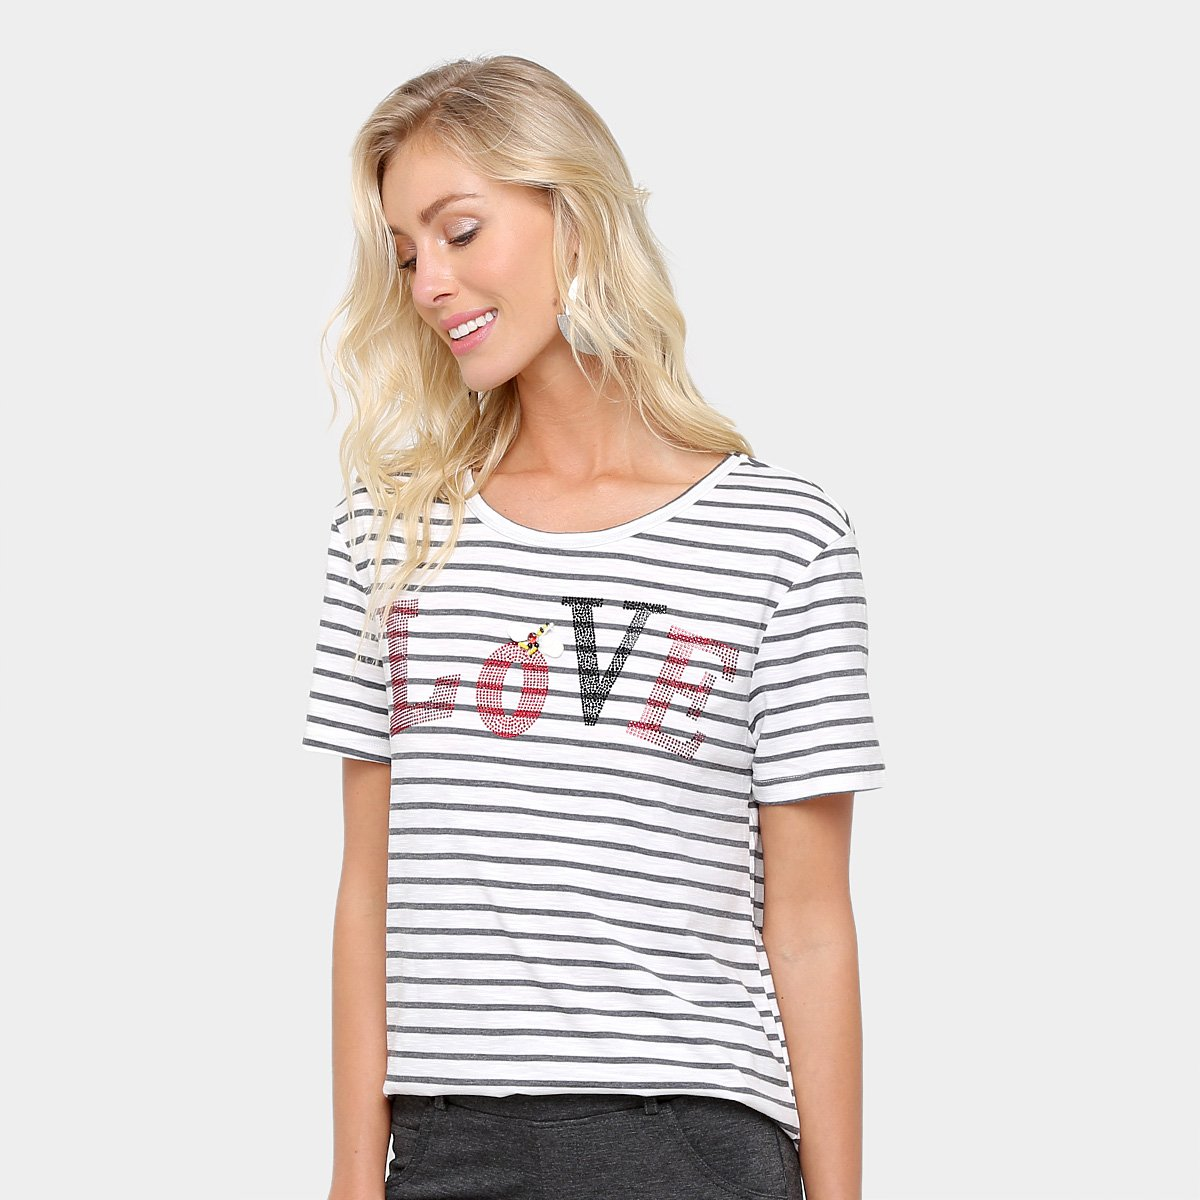 d1c0a43bf FornecedorZattini. Camiseta Facinelli Listrada Love Feminina